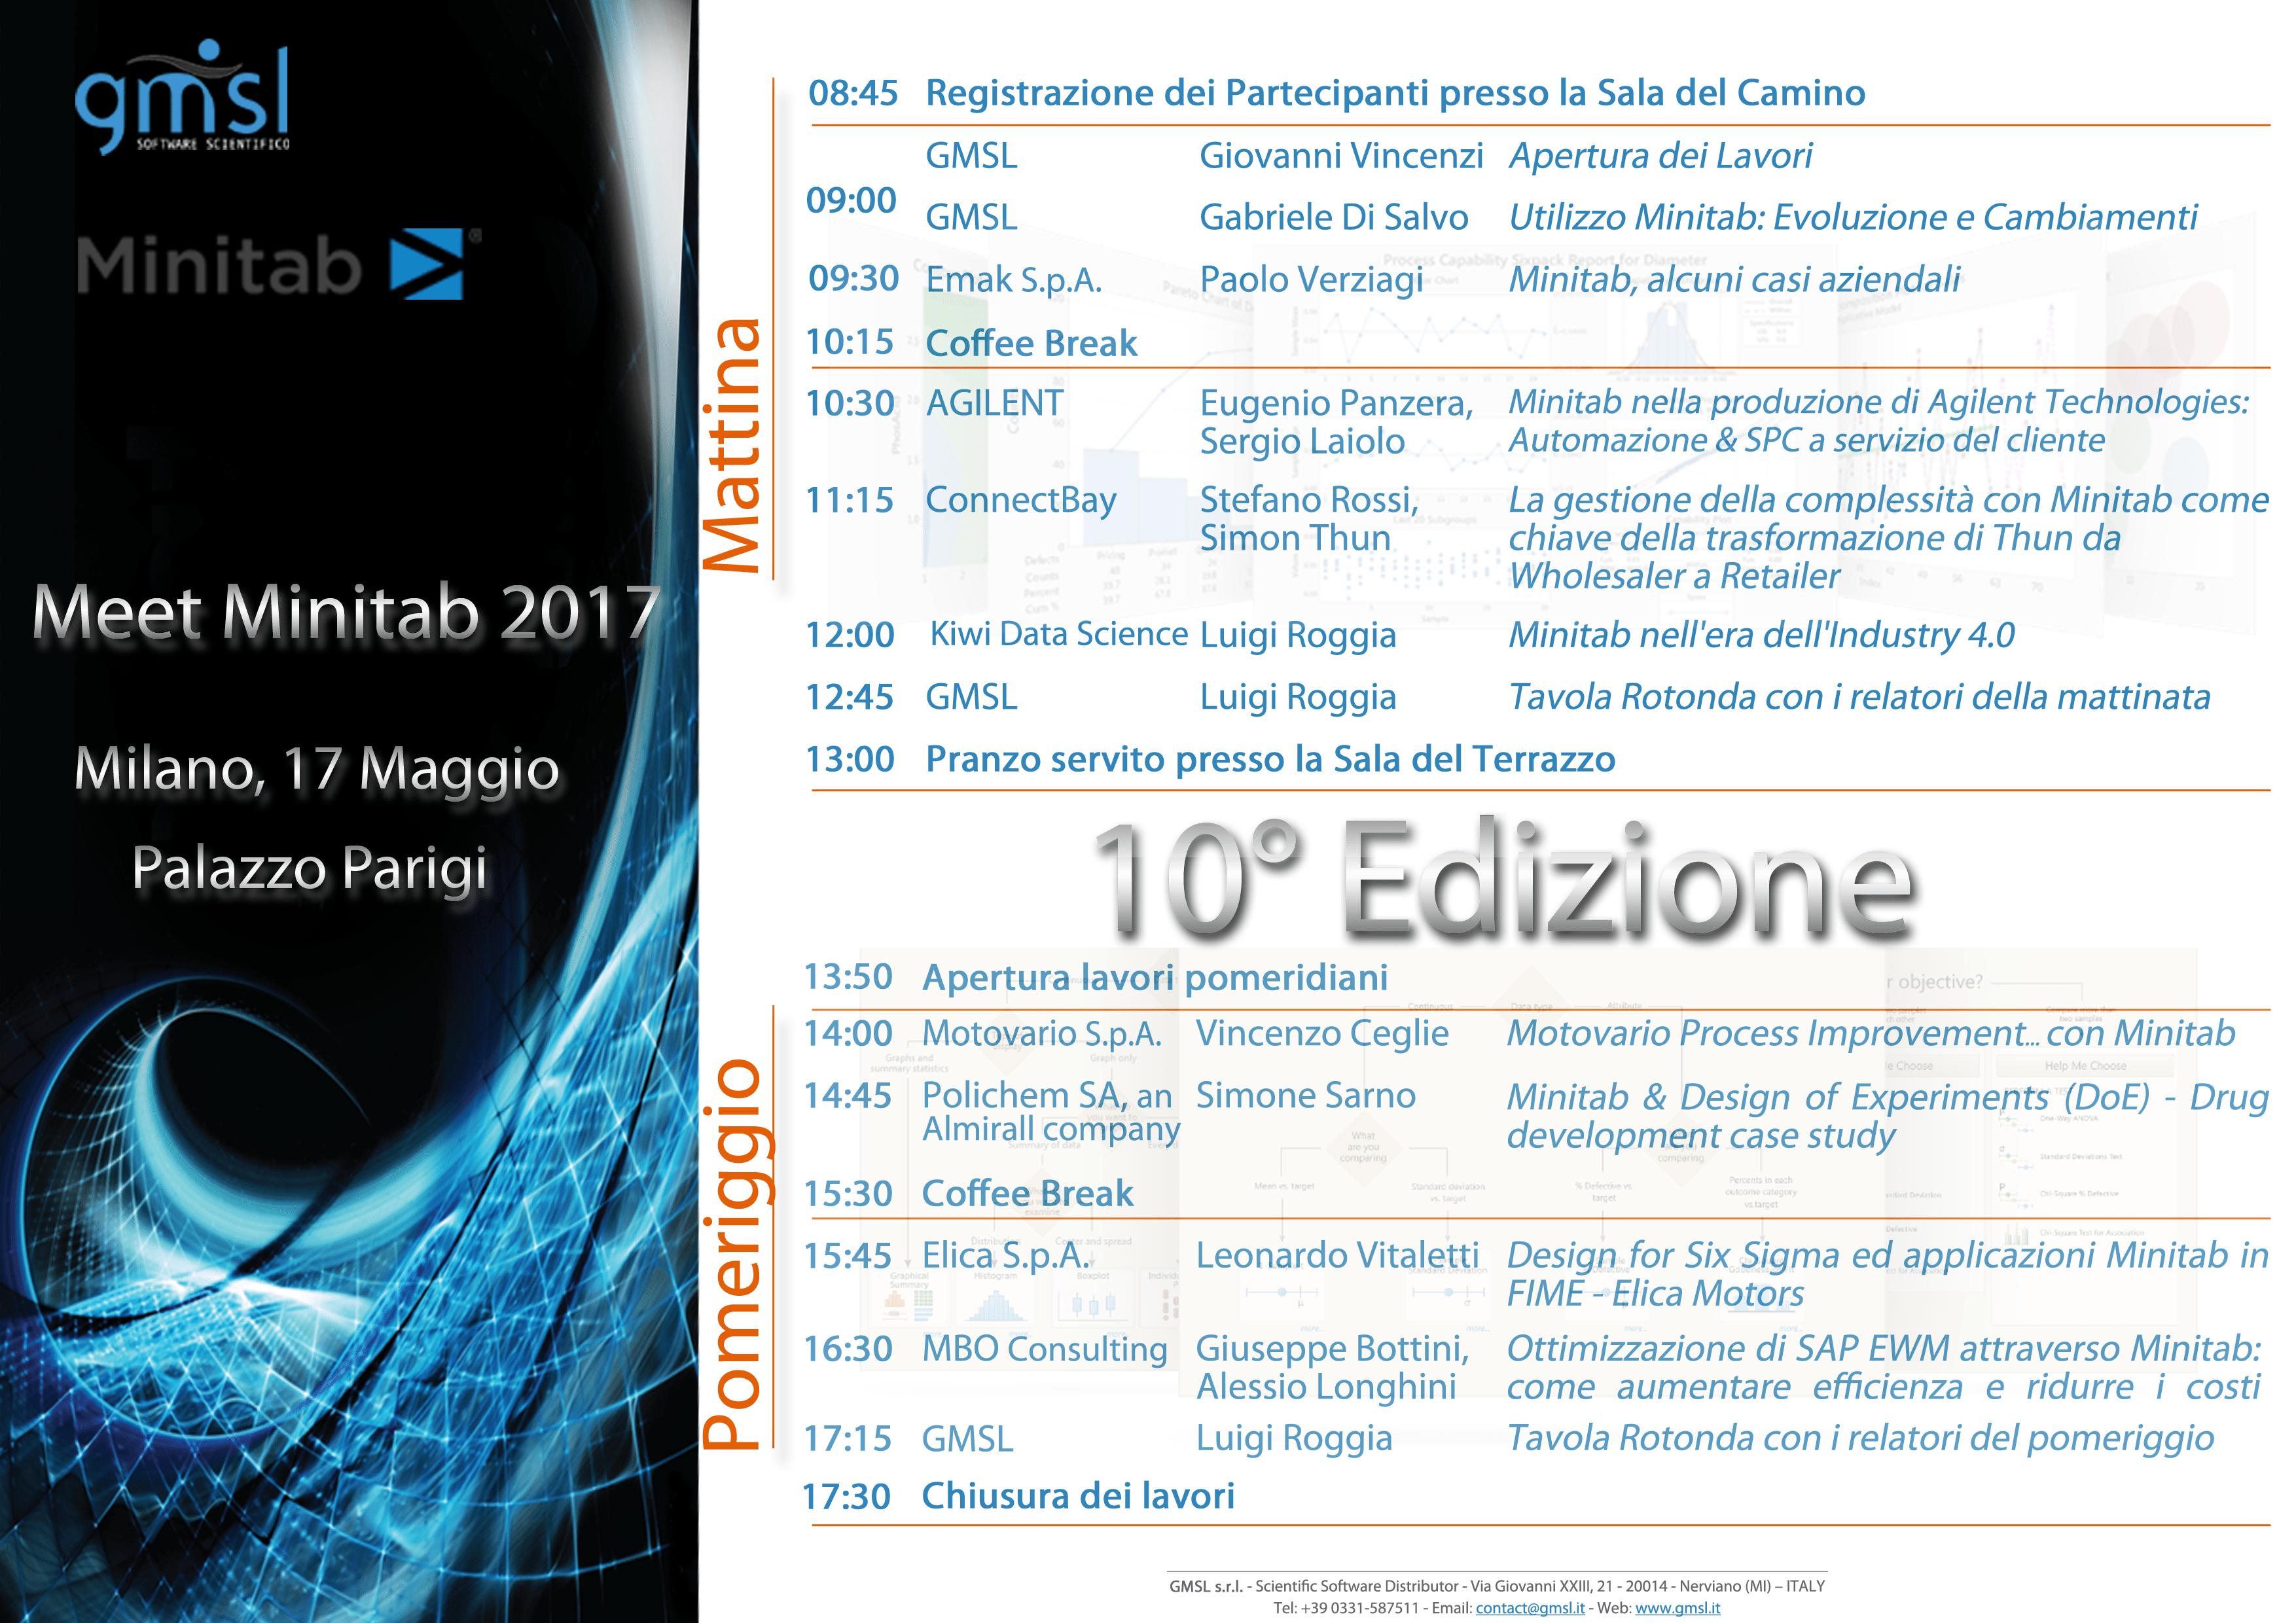 2017_meet-minitab_programma Meet Minitab 2017: consulta le presentazioni dei relatori!